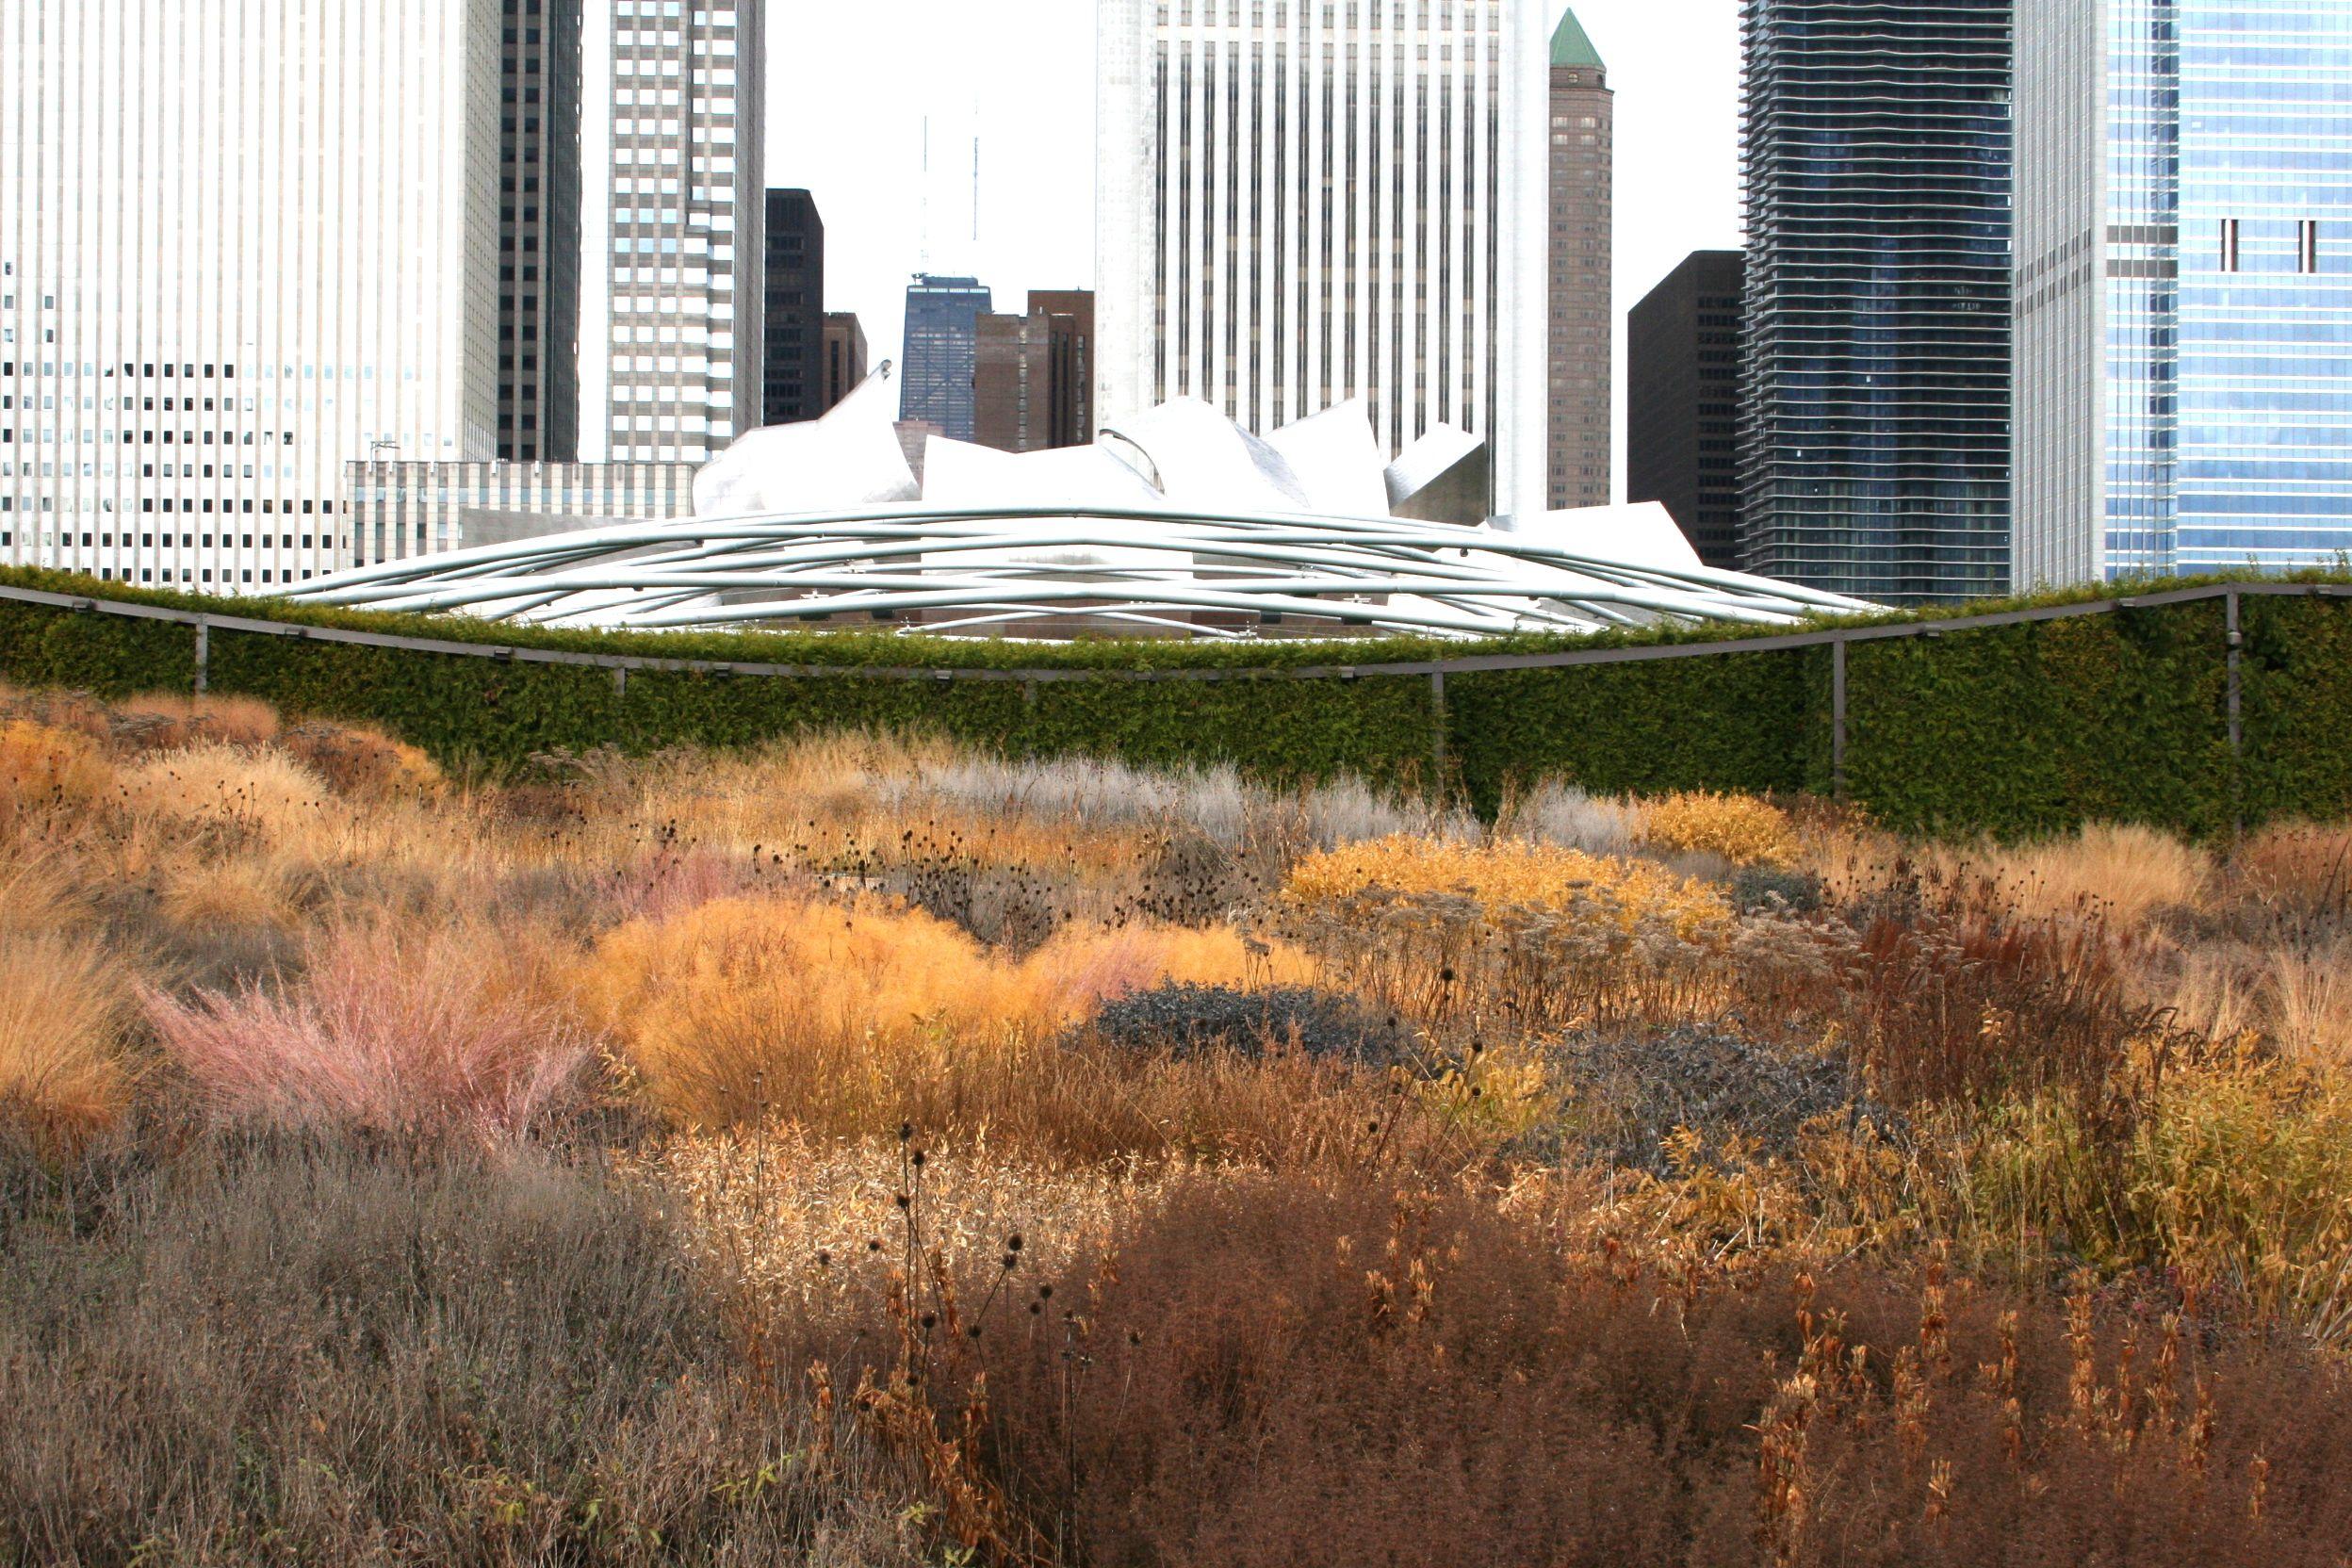 piet oudolf + ggn :: millennium park, chicago | Piet Oudolf is a ...